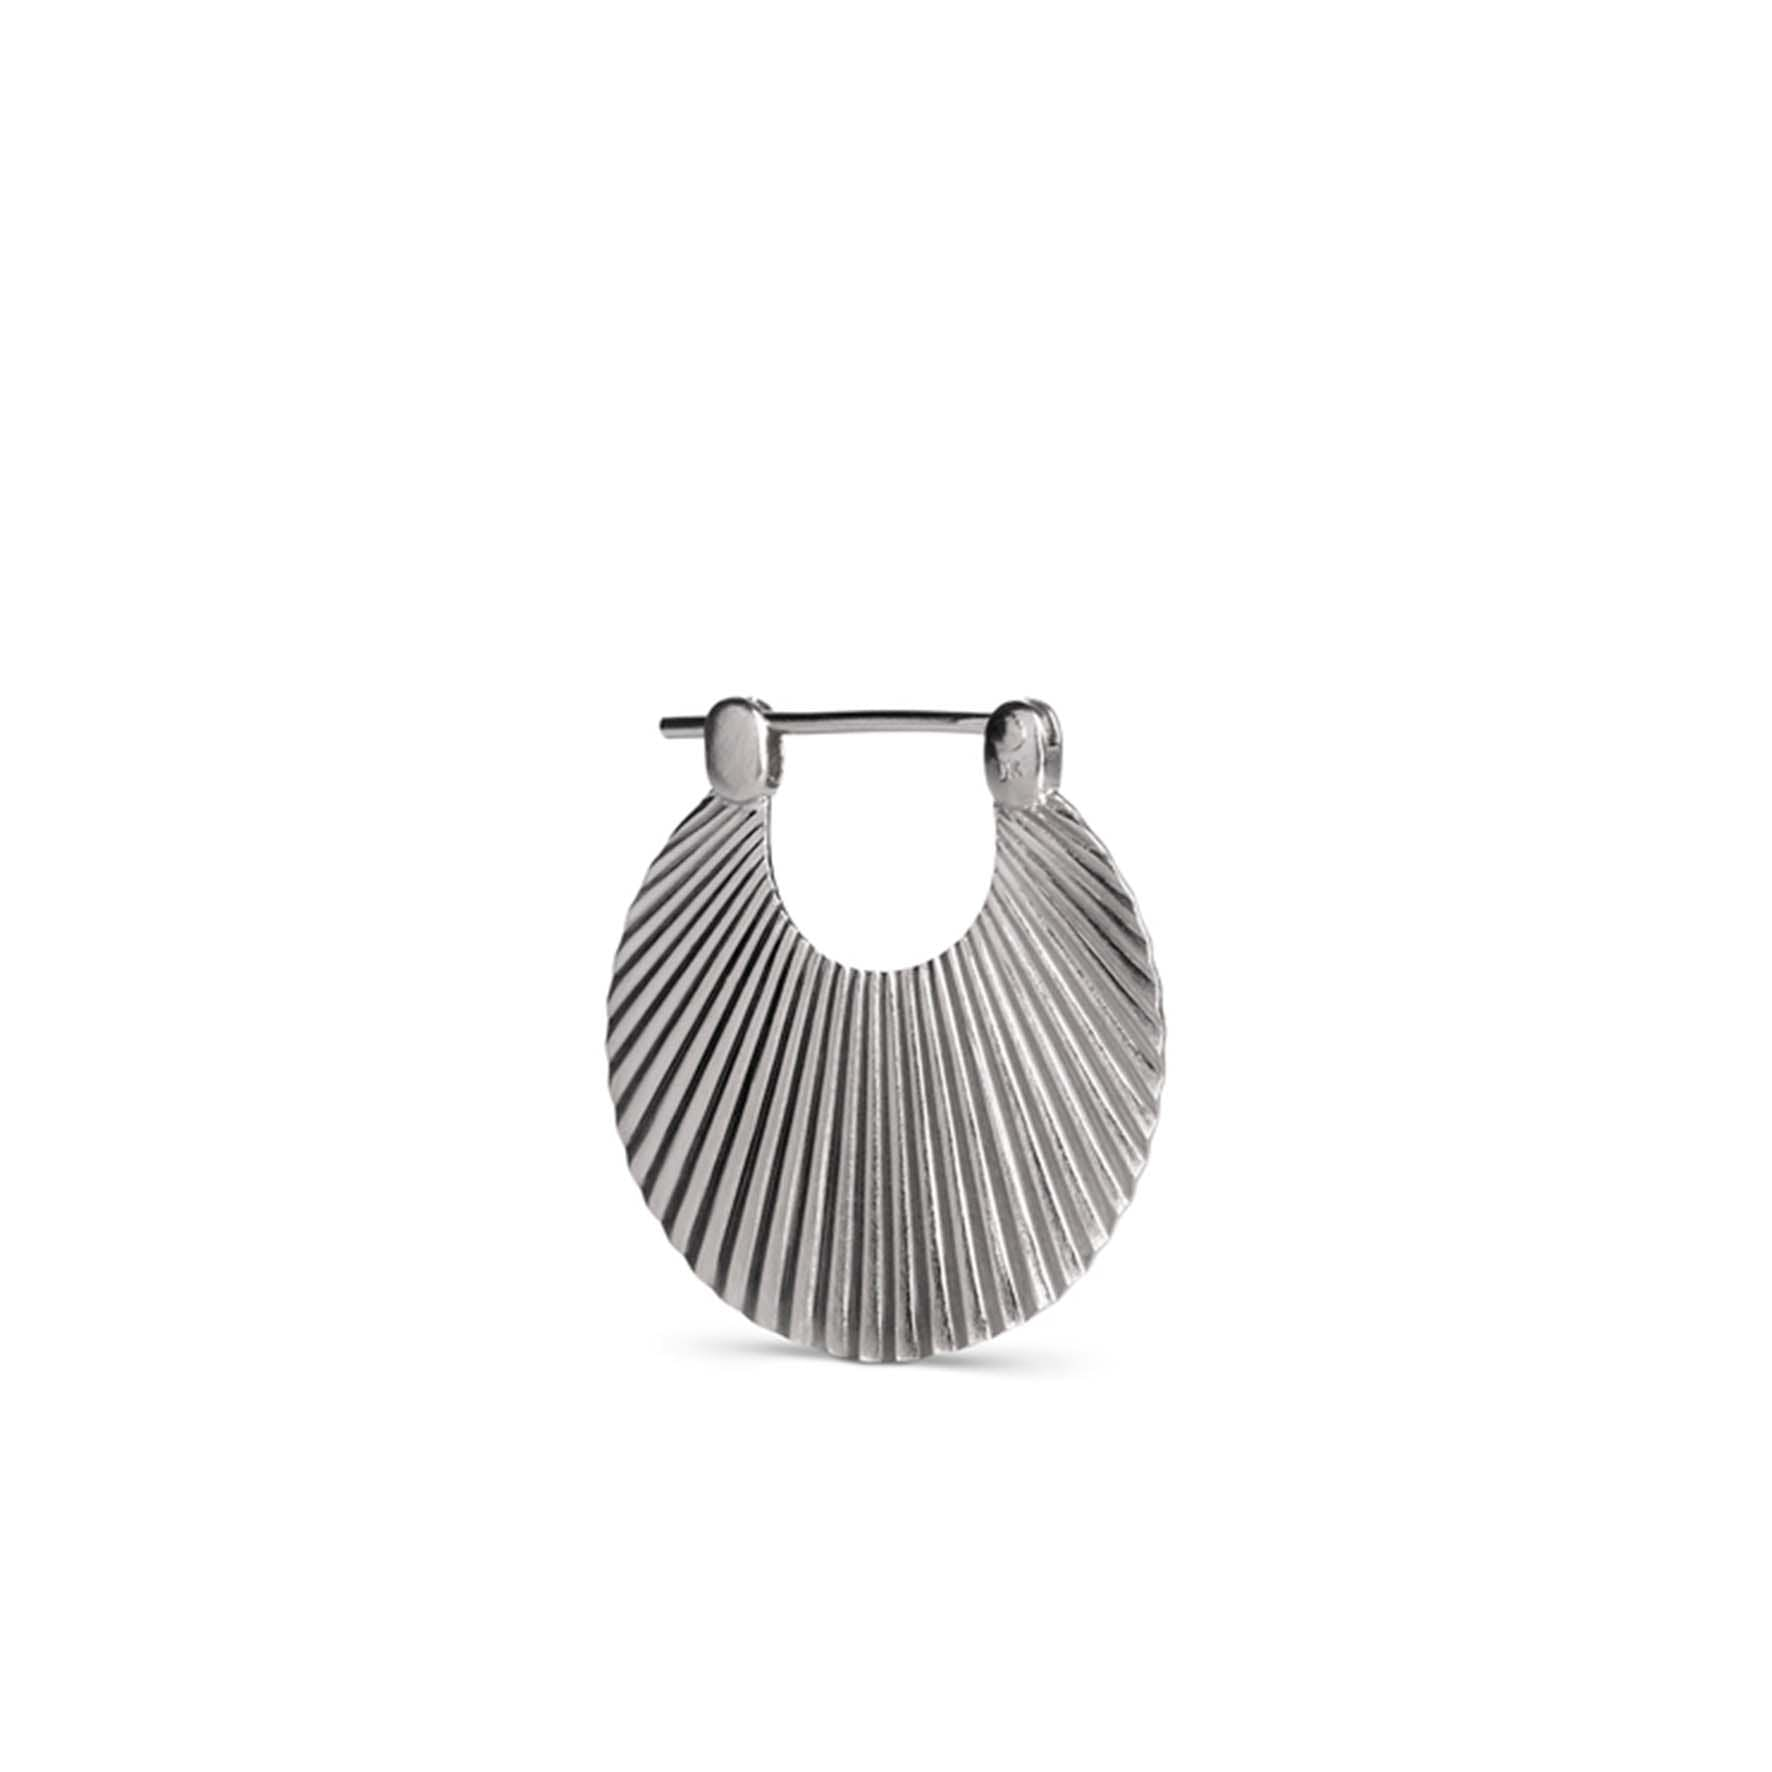 Small Shell Earring von Jane Kønig in Silber Sterling 925 Matt